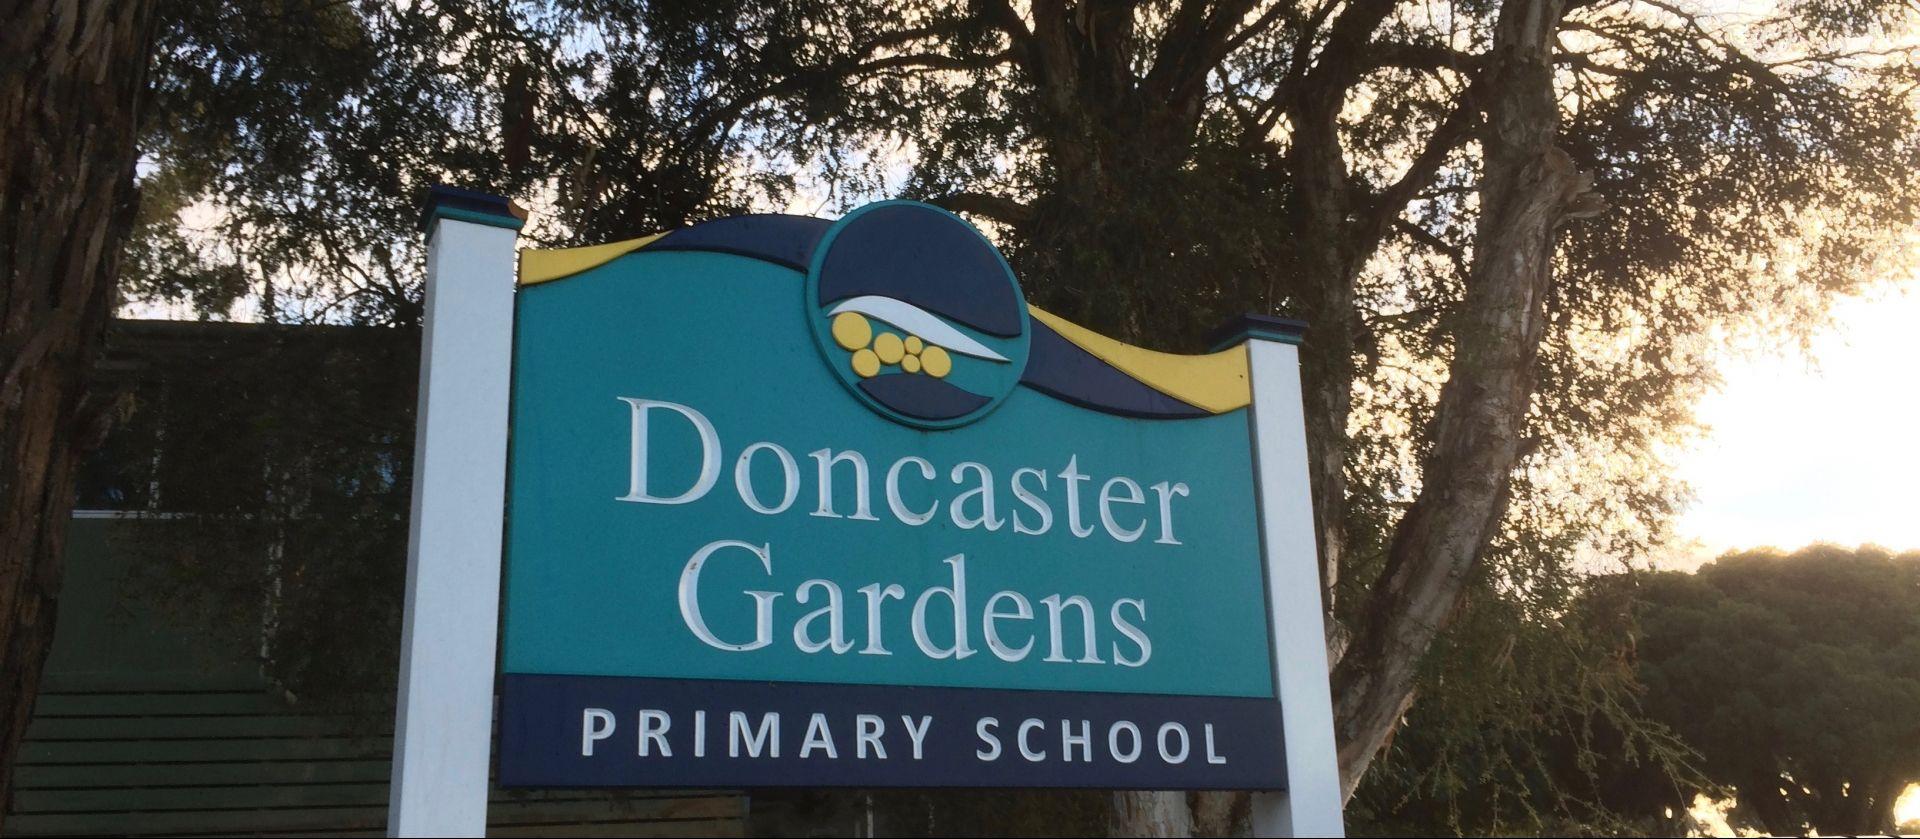 Doncaster Gardens Primary School